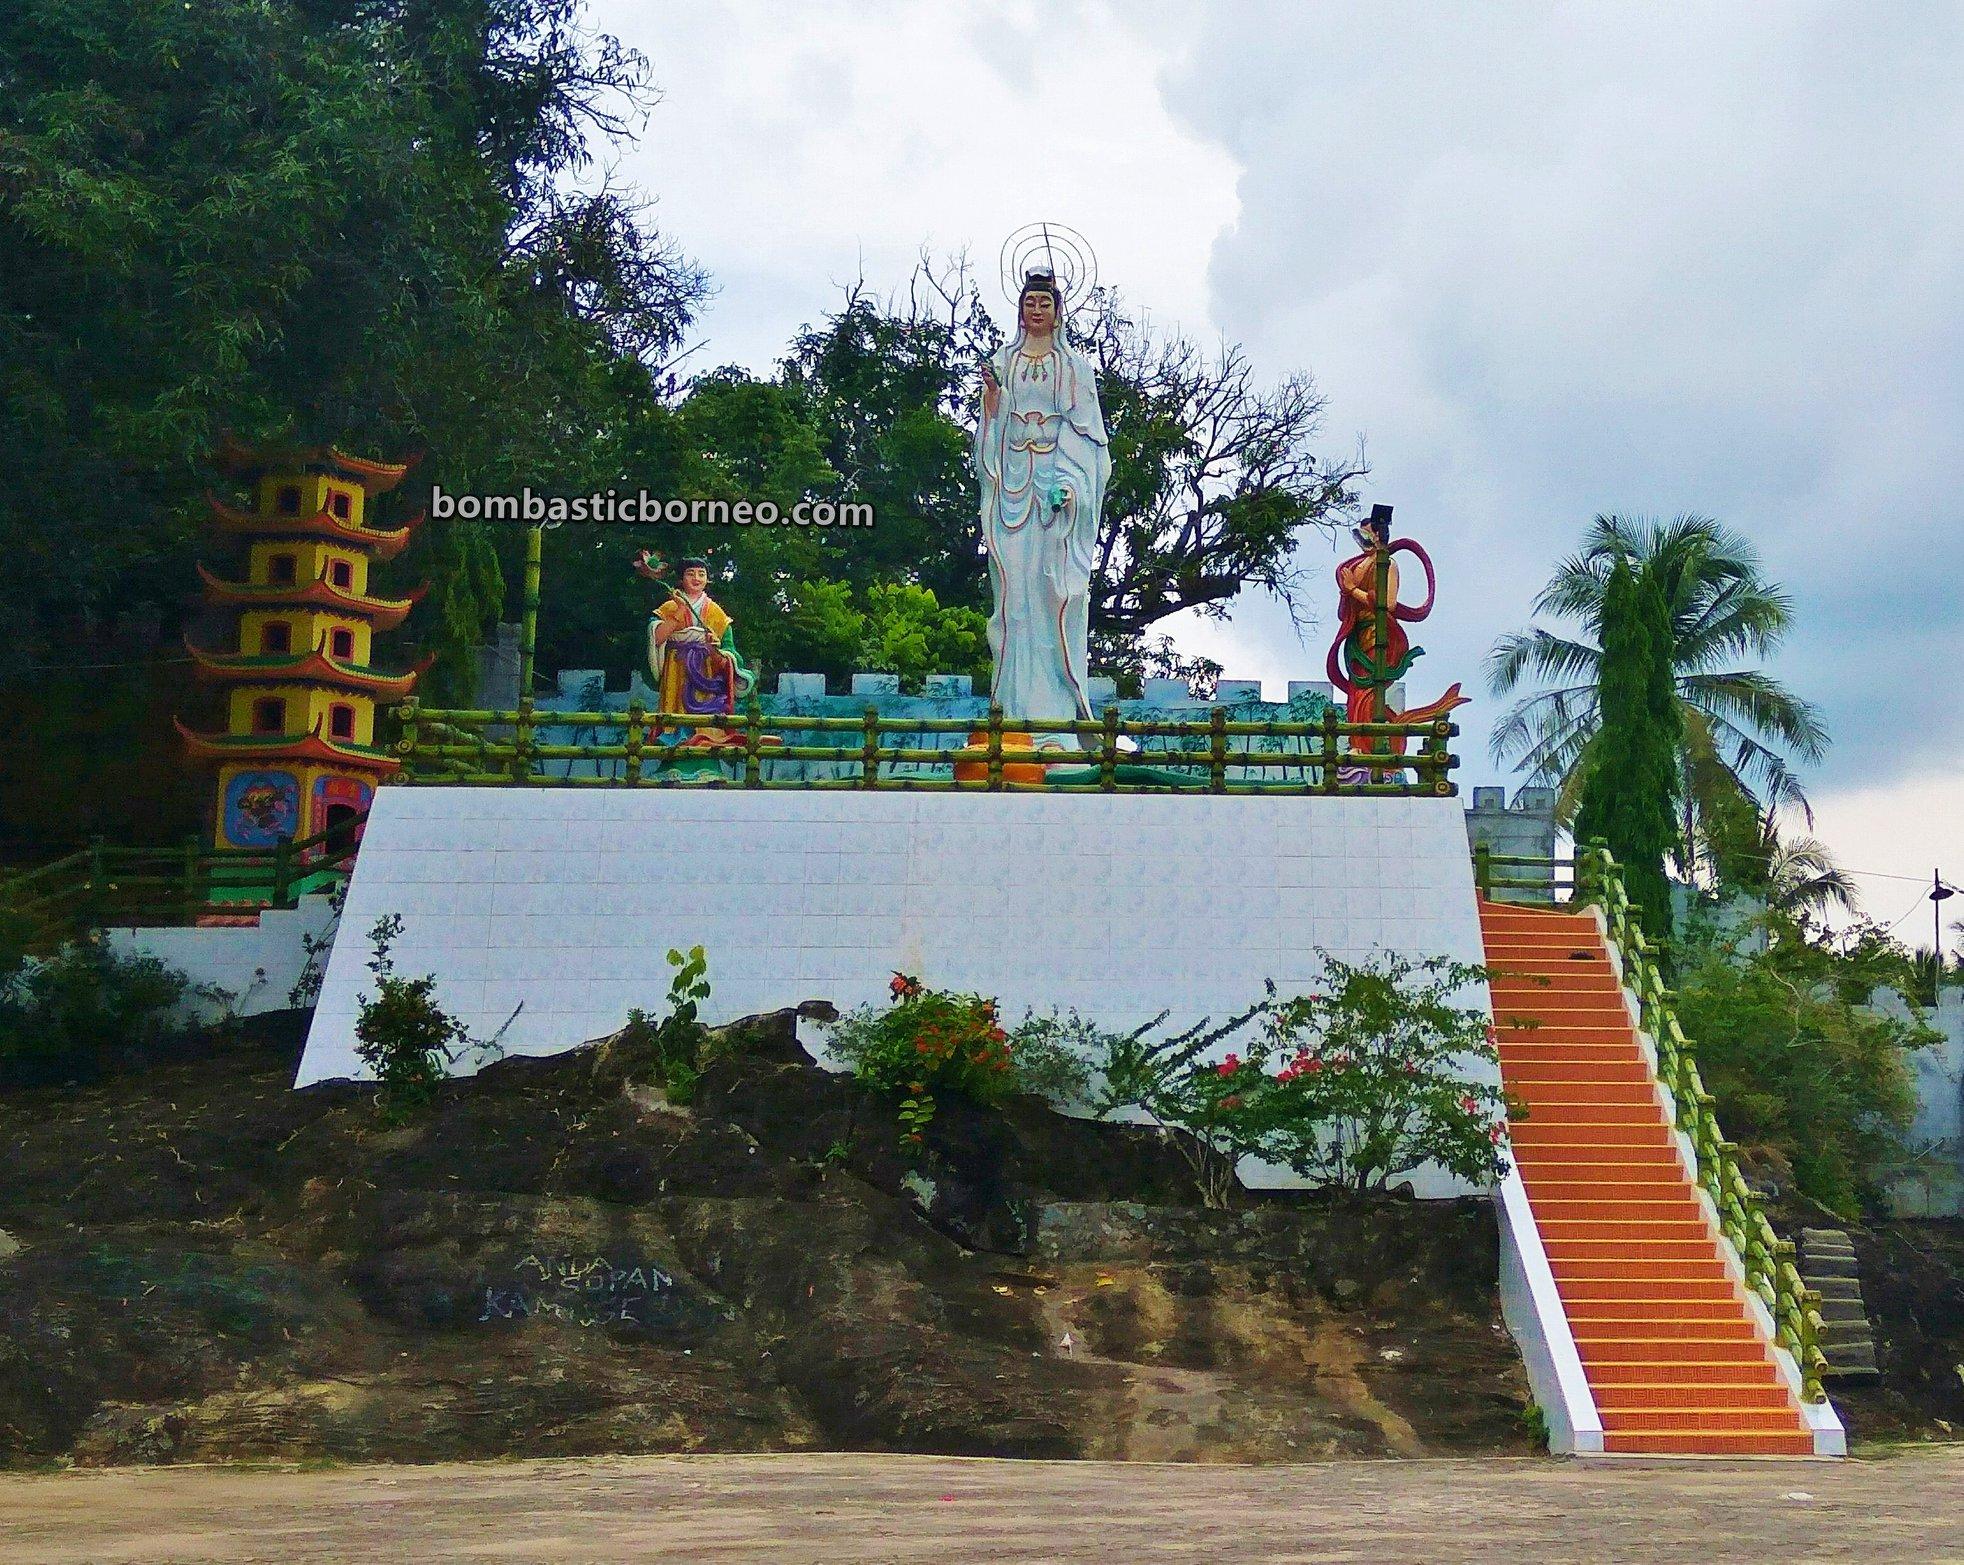 Kampung Cina, guan yin temple, Sambas, Indonesia, Kalimantan Barat, Sebangkau, Pemangkat, Obyek wisata, Tourism, tourist attraction, travel guide, Vihara Tri Dharma Buddha, Trans Borneo, destination,